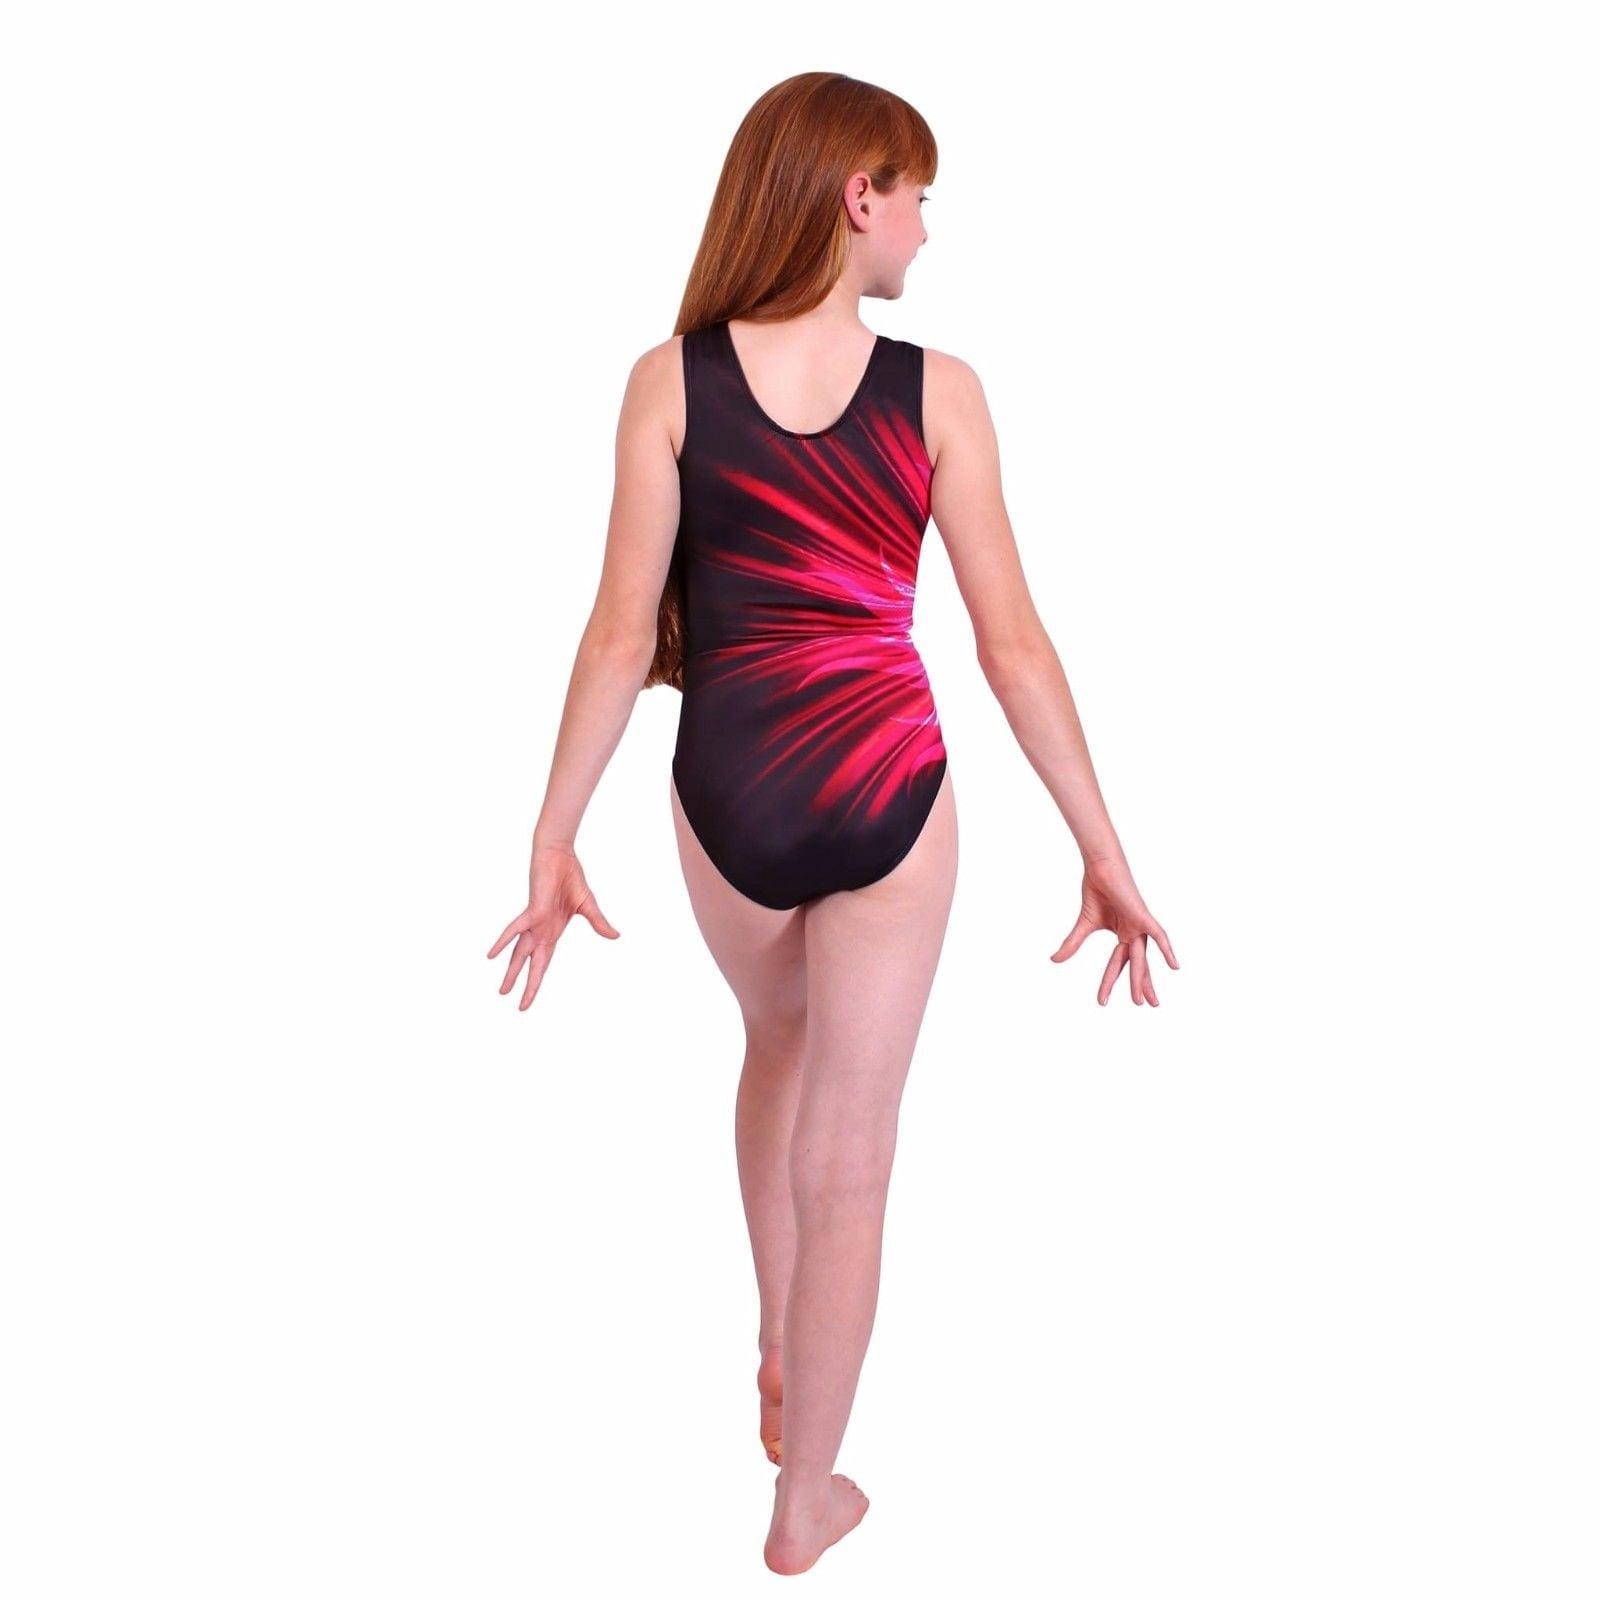 ccce11ca6434 really cheap ed138 00e37 age 5 6 7 8 flare girls gymnastics leotard ...